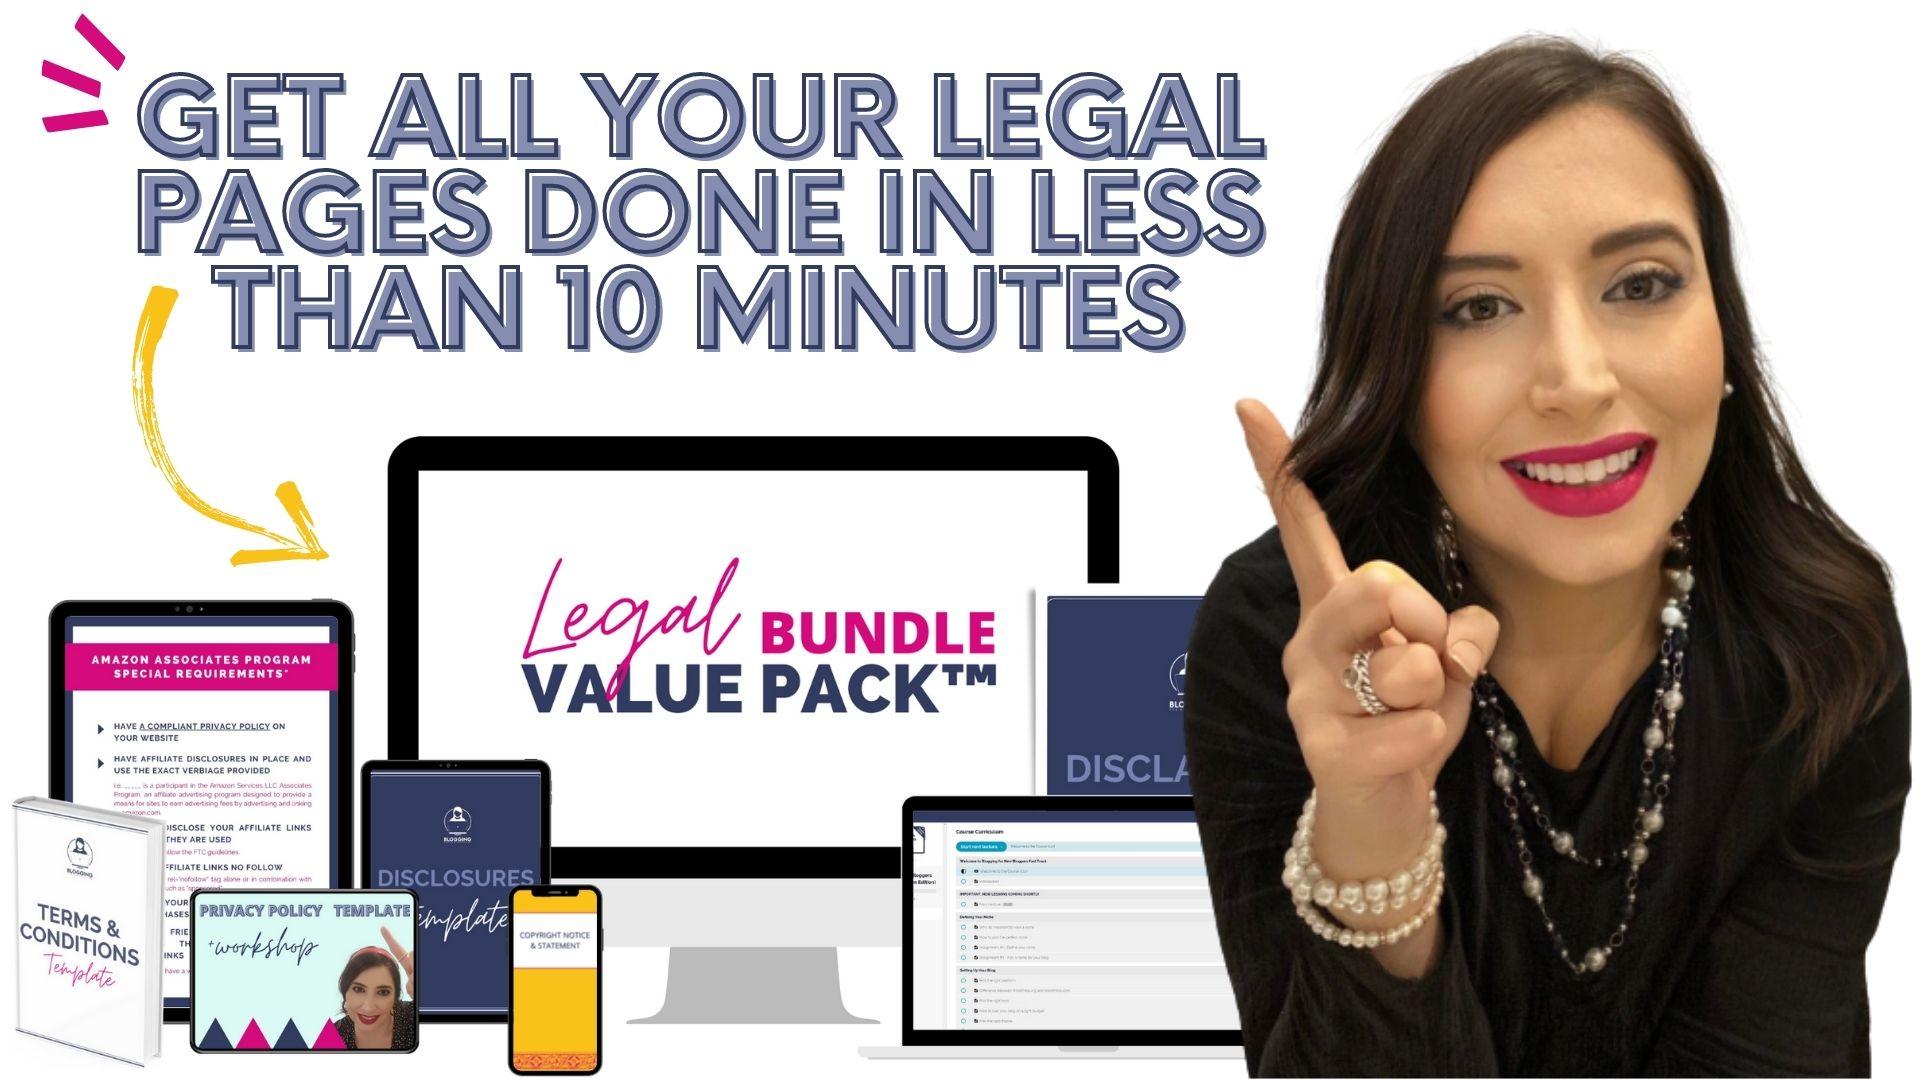 Legal Bundle Value Pack Video